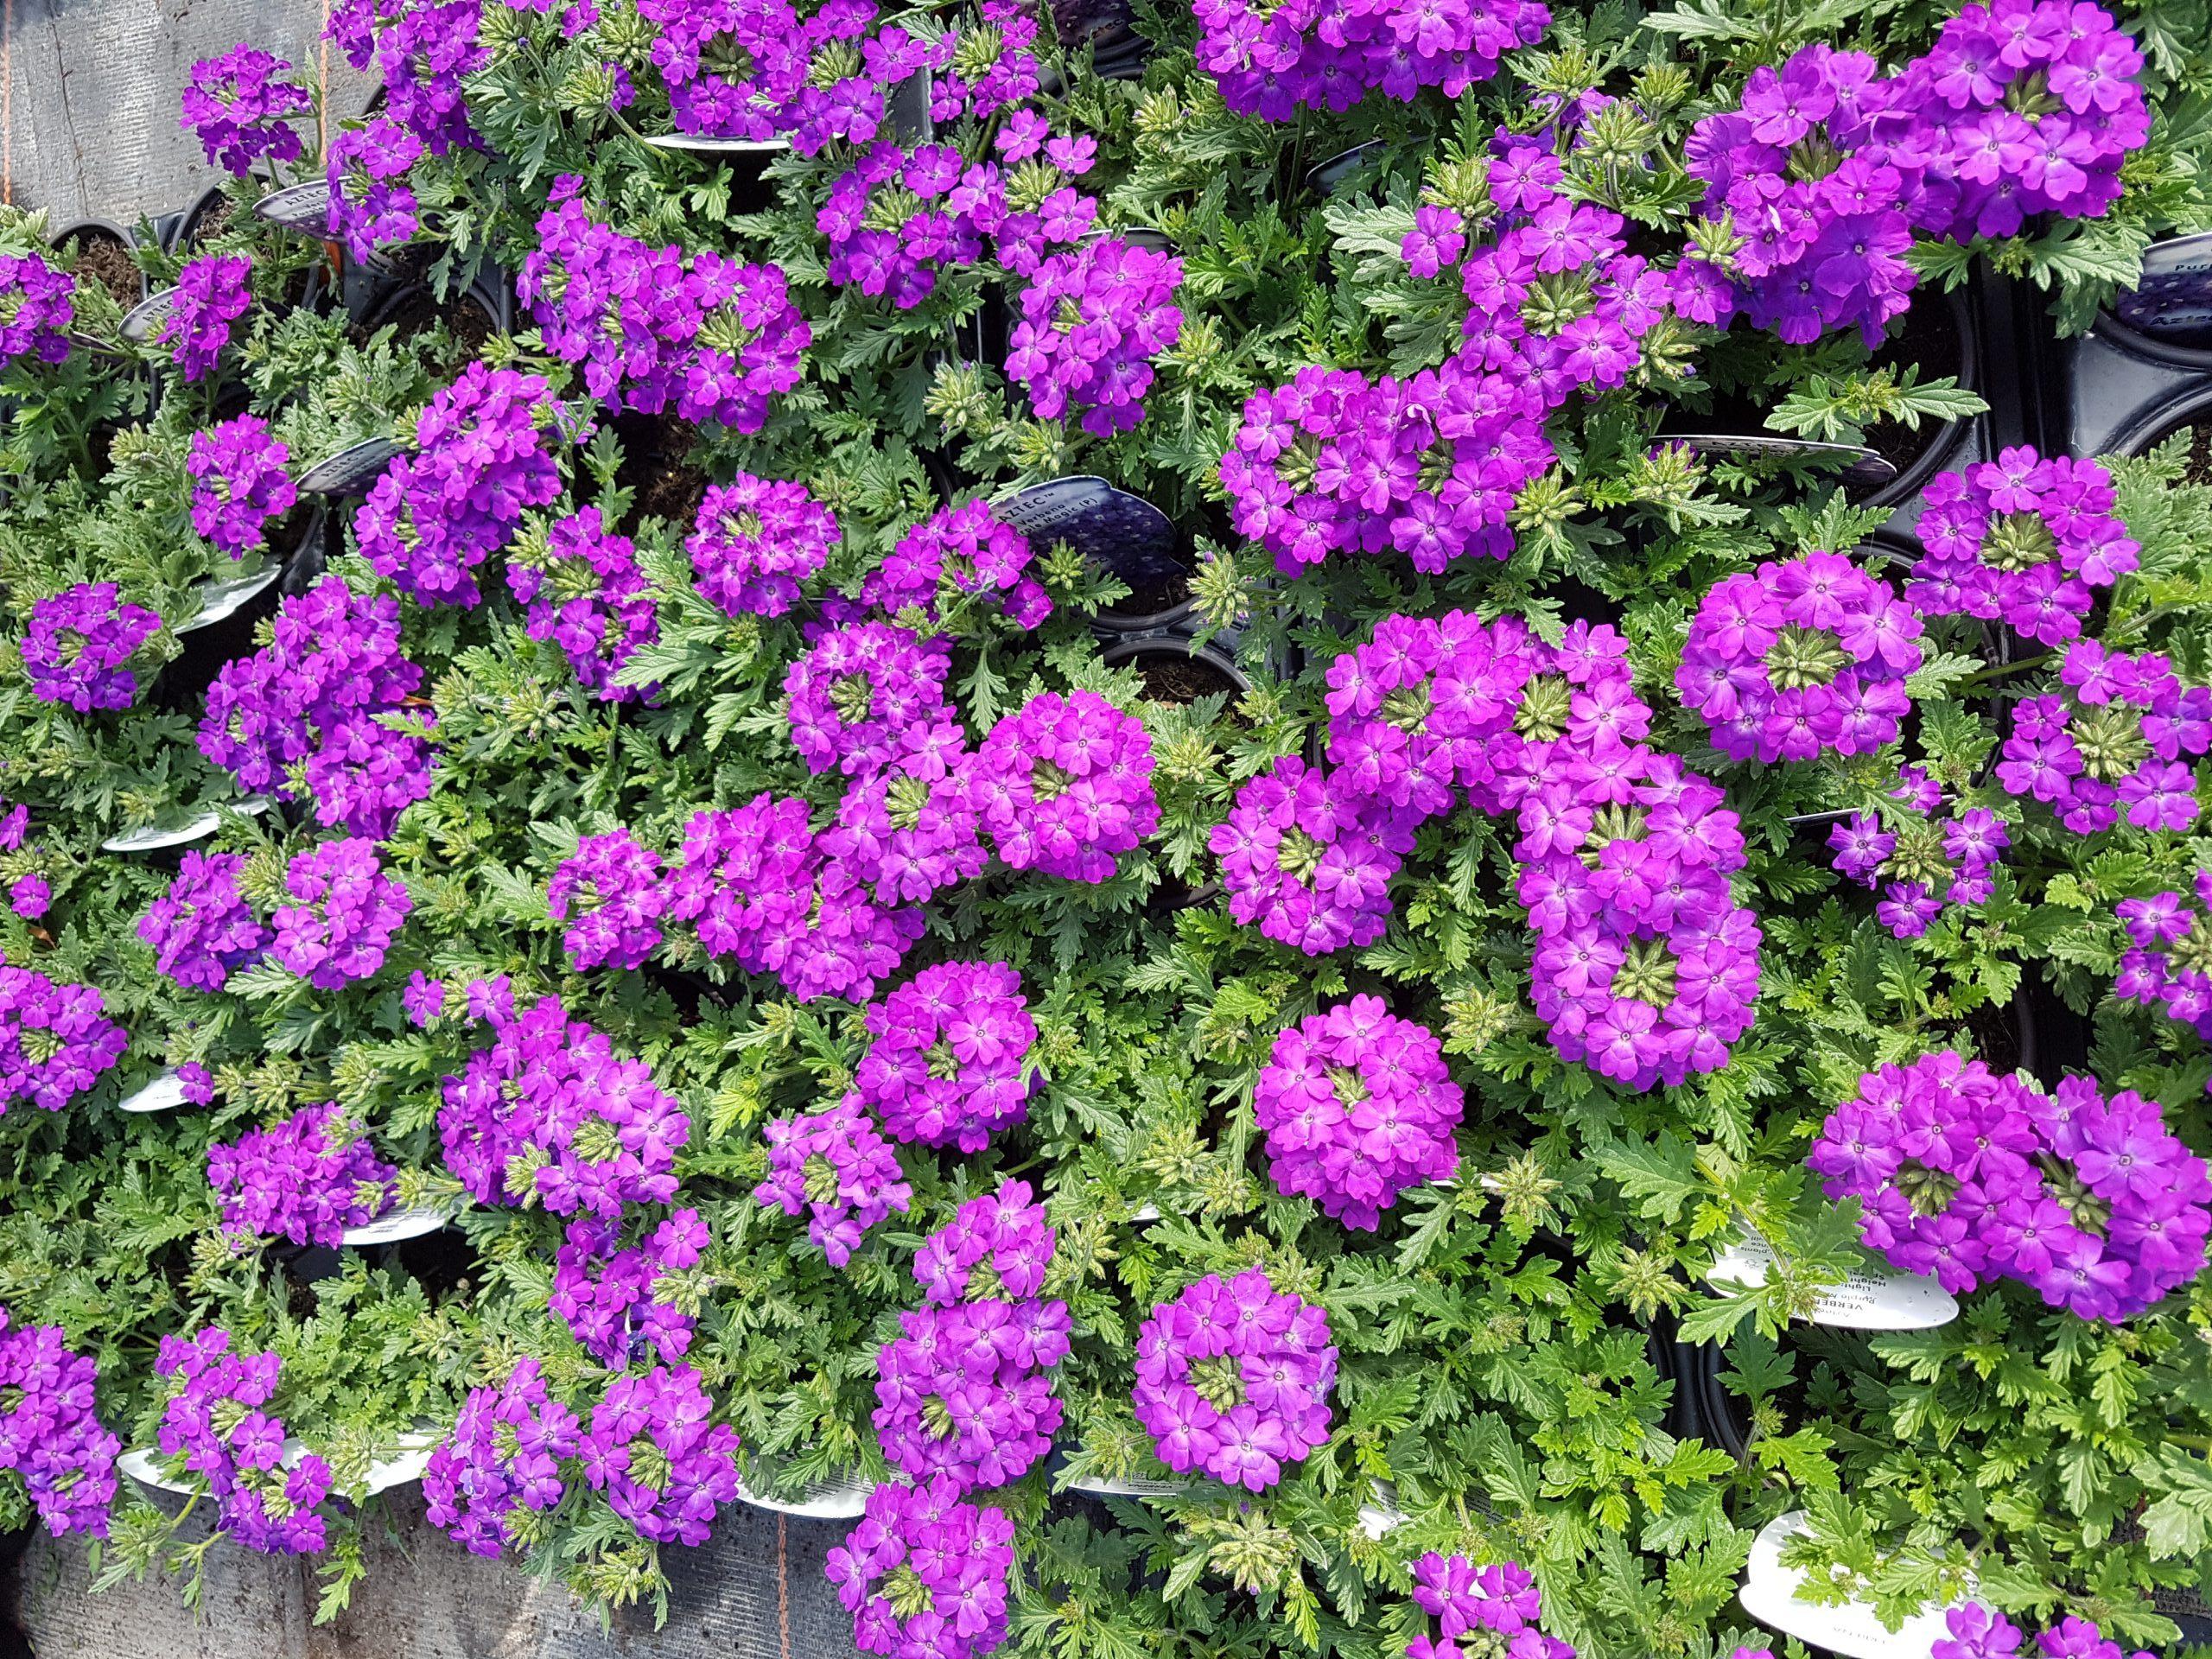 Verbena bedding plants